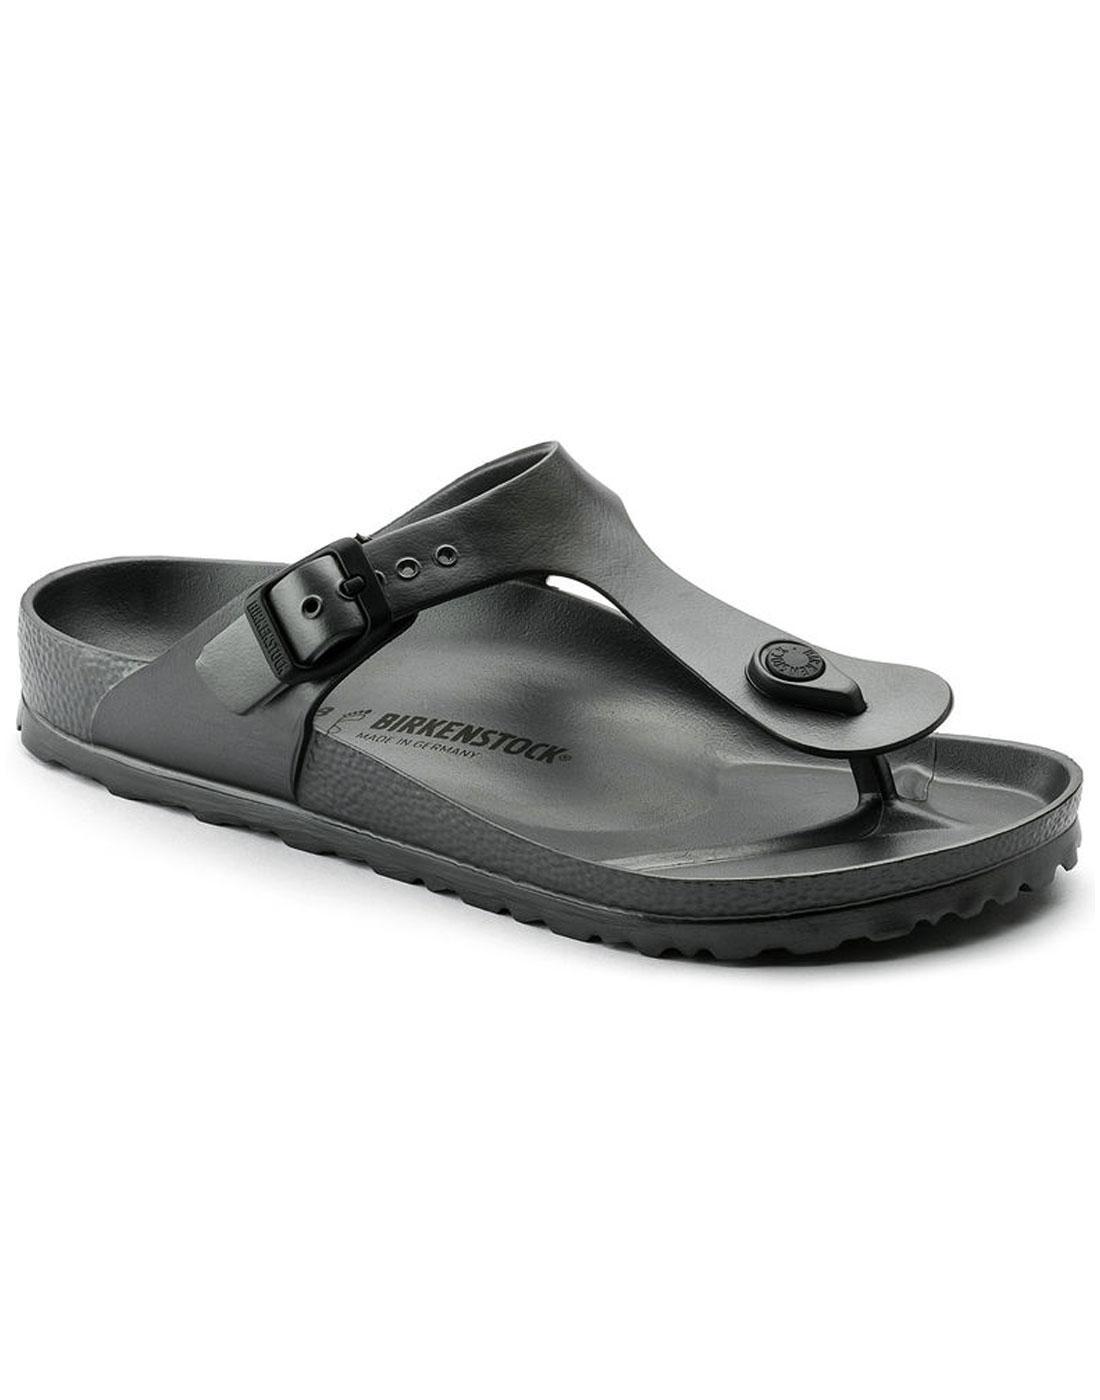 Gizeh EVA BIRKENSTOCK Ultra Light Toe Grip Sandals